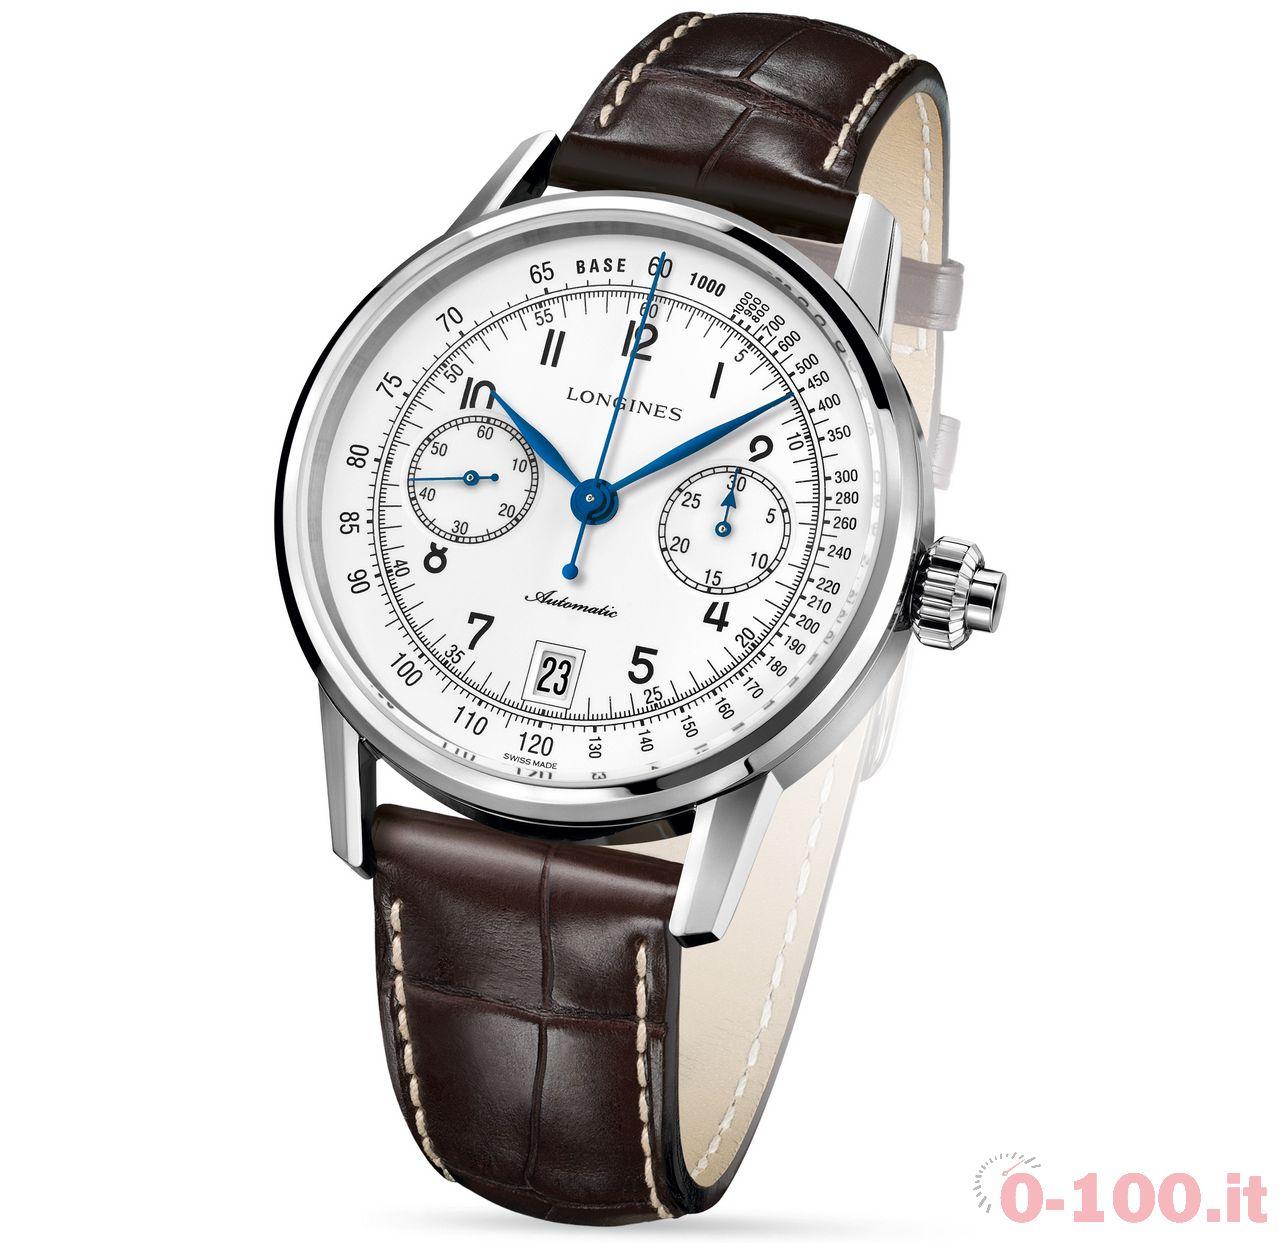 longines-column-wheel-single-push-piece-chronograph-price_0-1003